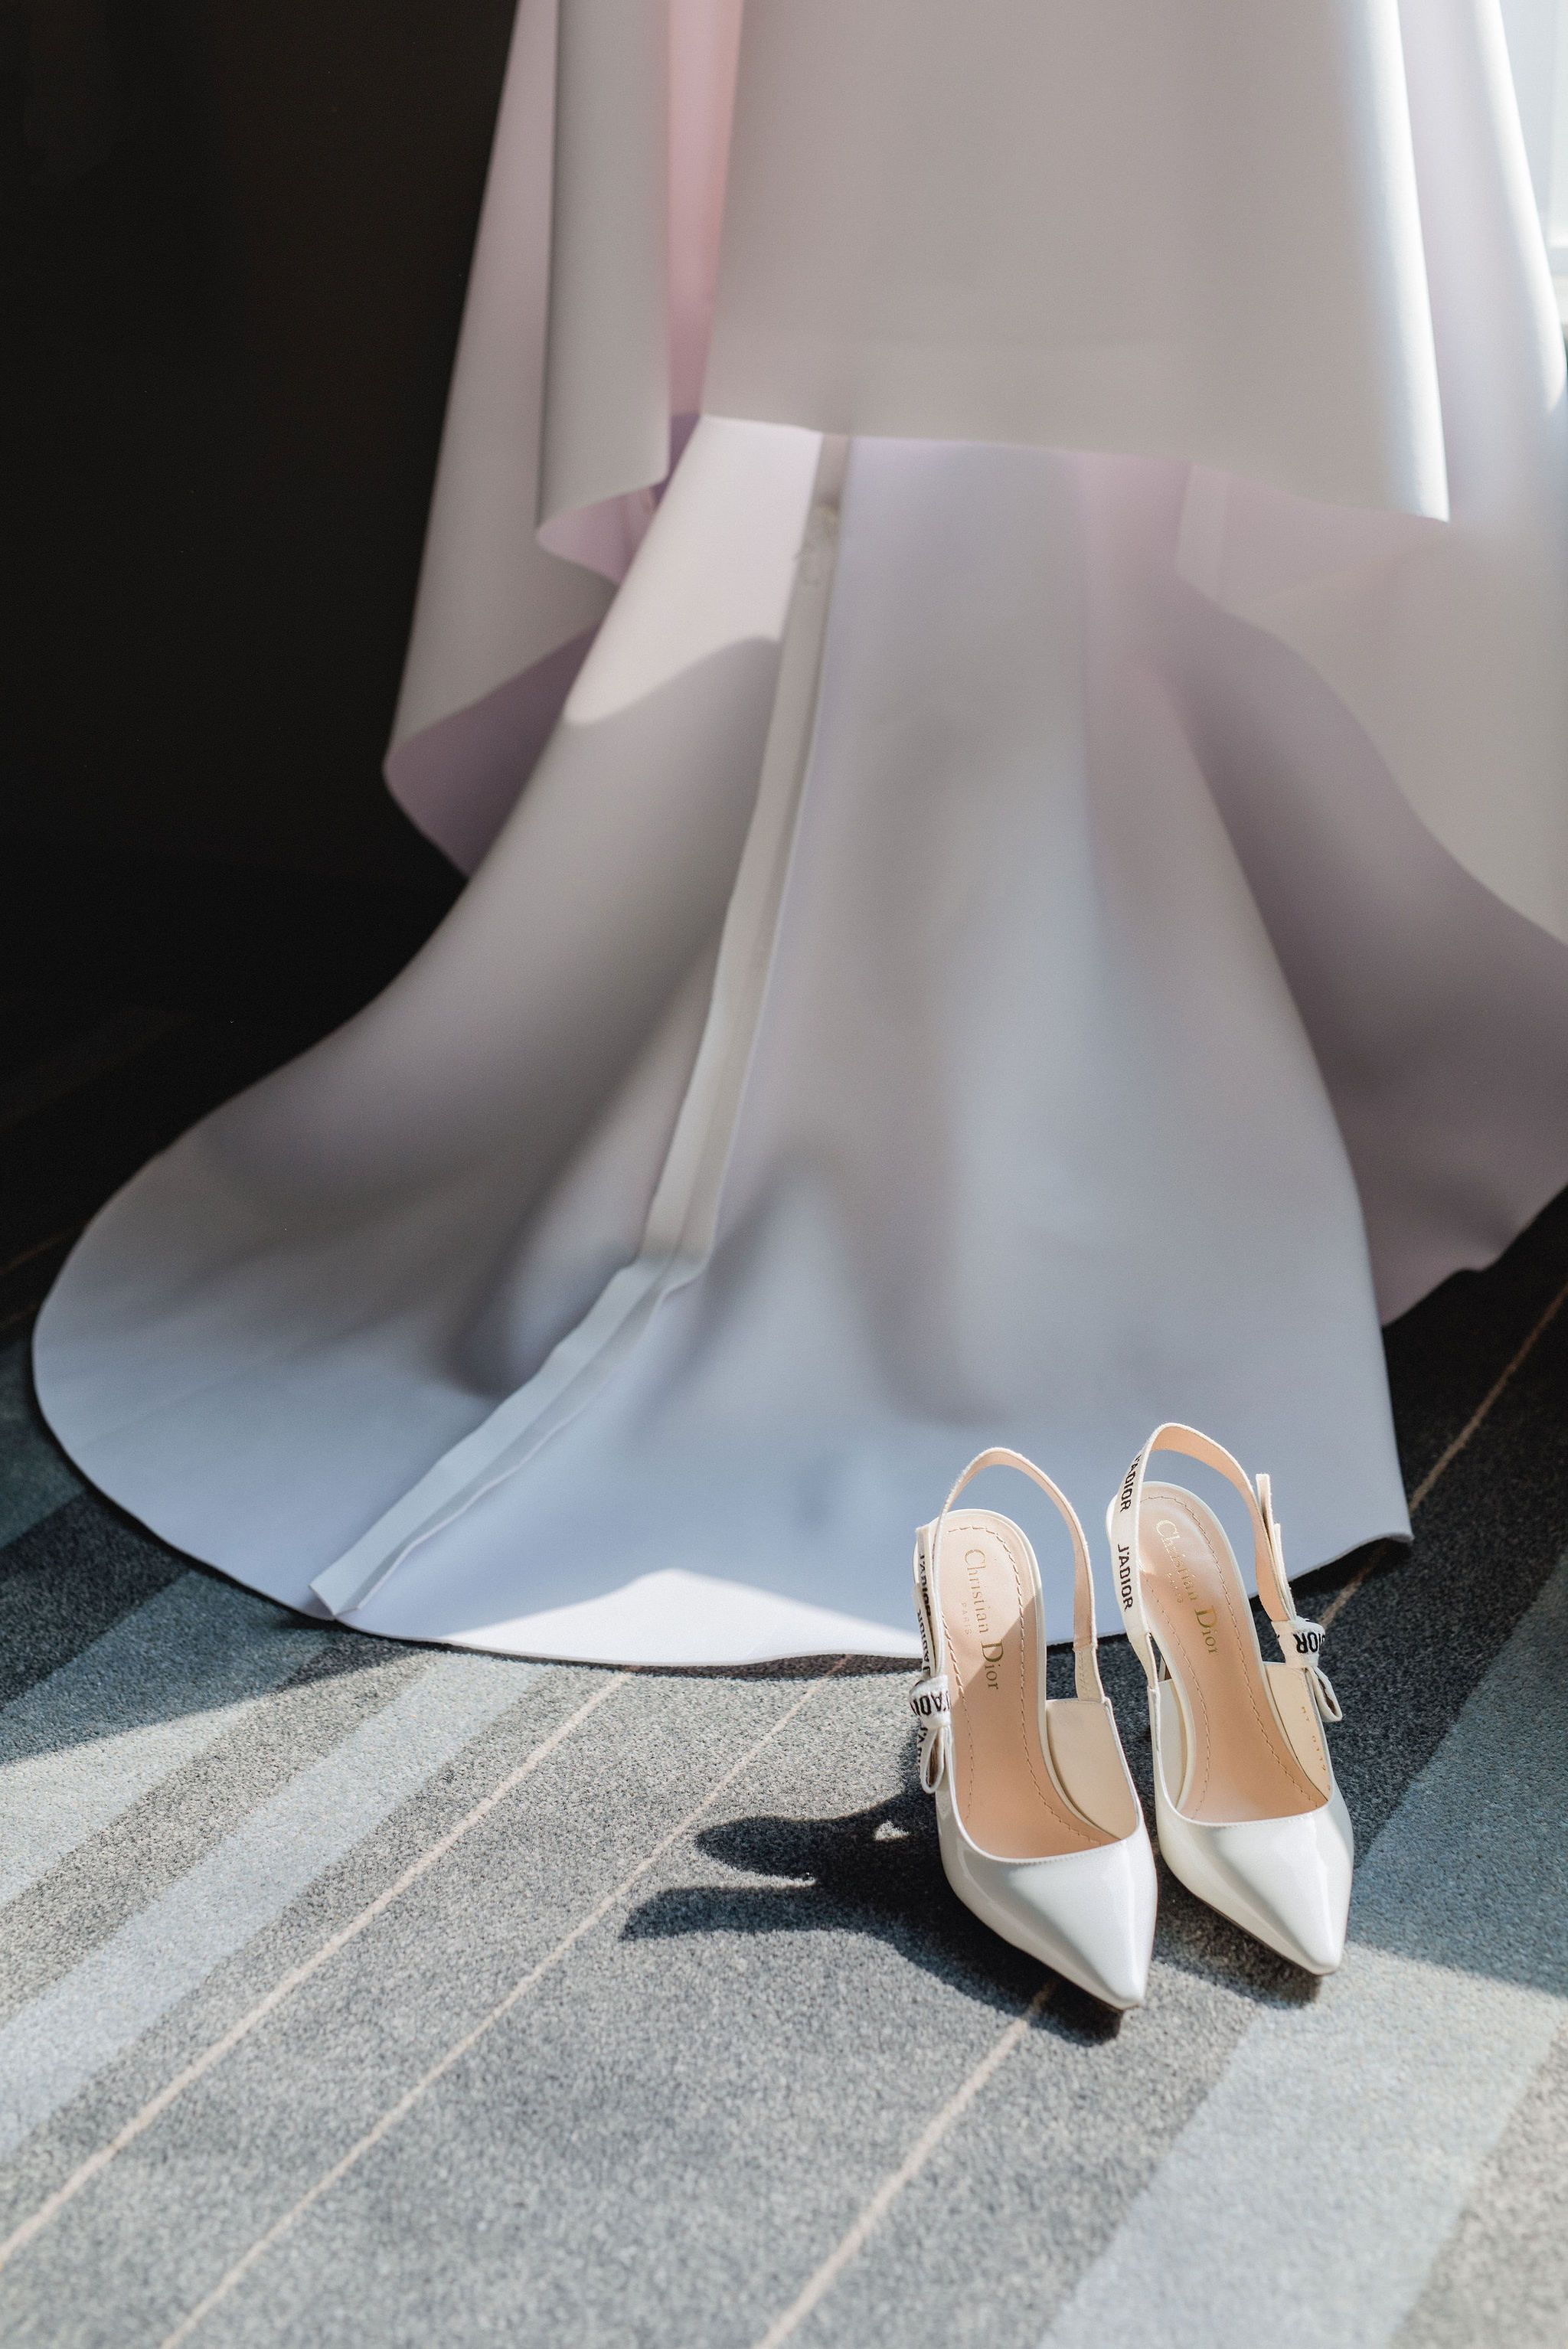 Bridal Details Dior Shoes Heels Wedding Details Flatlay Layflat Toronto Bride Modern Romantic Dior Shoes Wedding Shoes Bride Wedding Heels